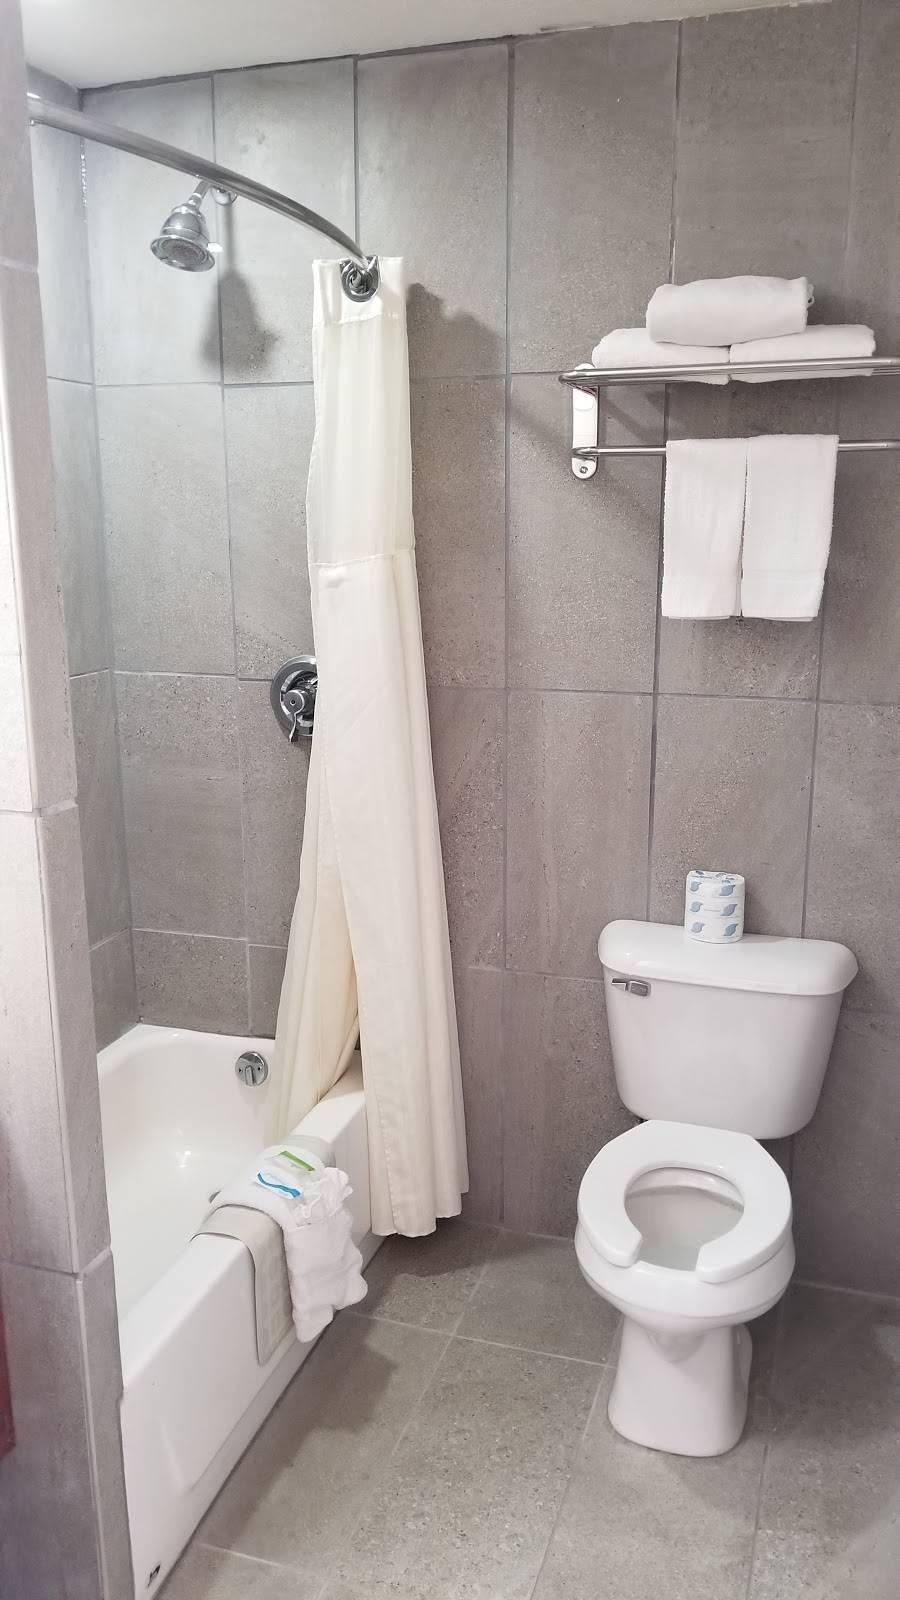 Travel Inn Omaha - lodging  | Photo 3 of 8 | Address: 10708 M St, Omaha, NE 68127, USA | Phone: (402) 597-4116